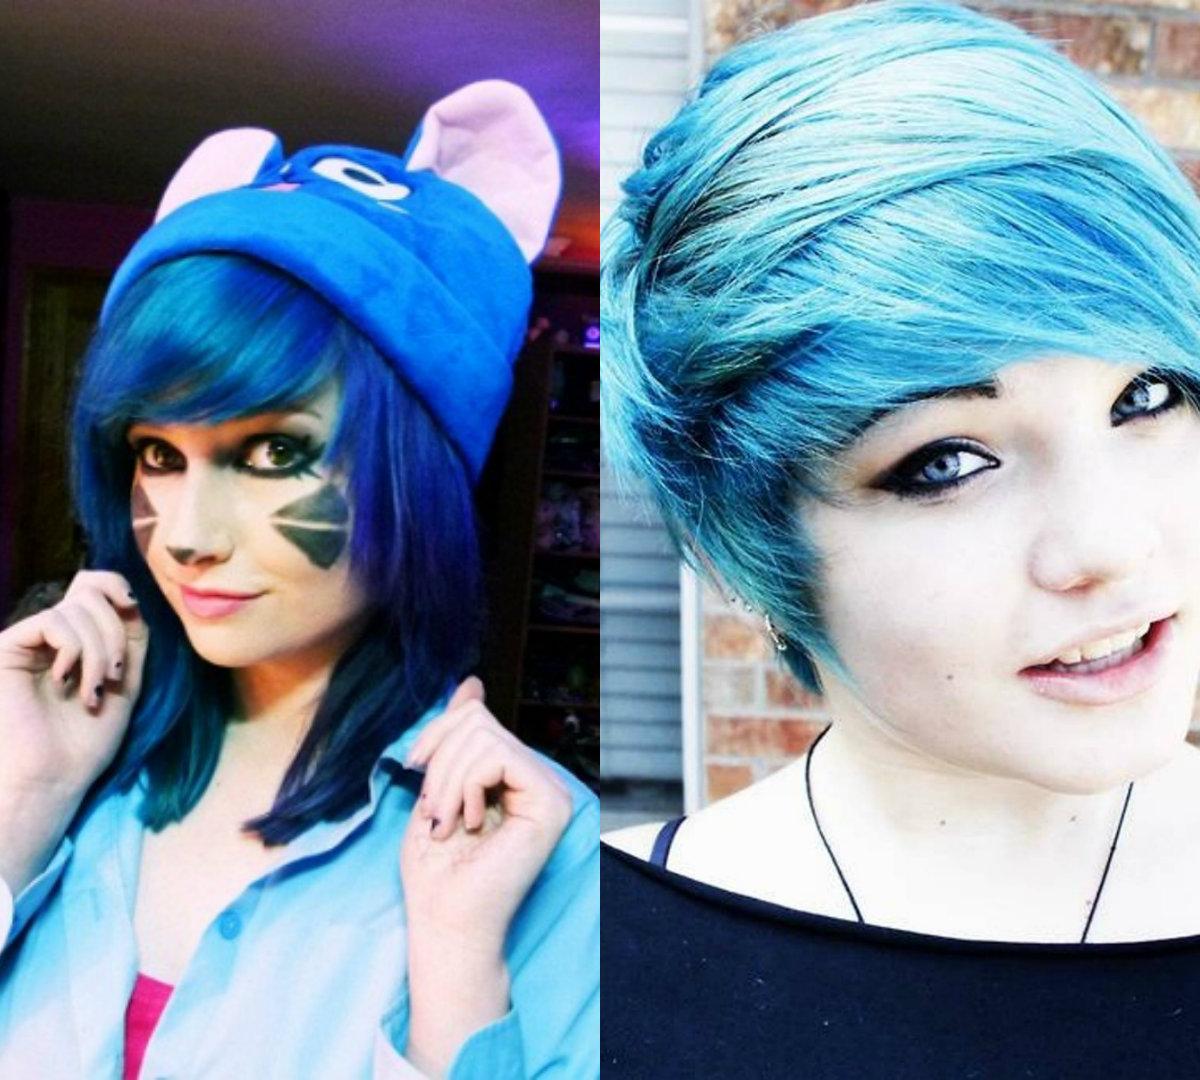 Idéias de penteado exclusivas diferentes de Emo Girl na elegante cor azul